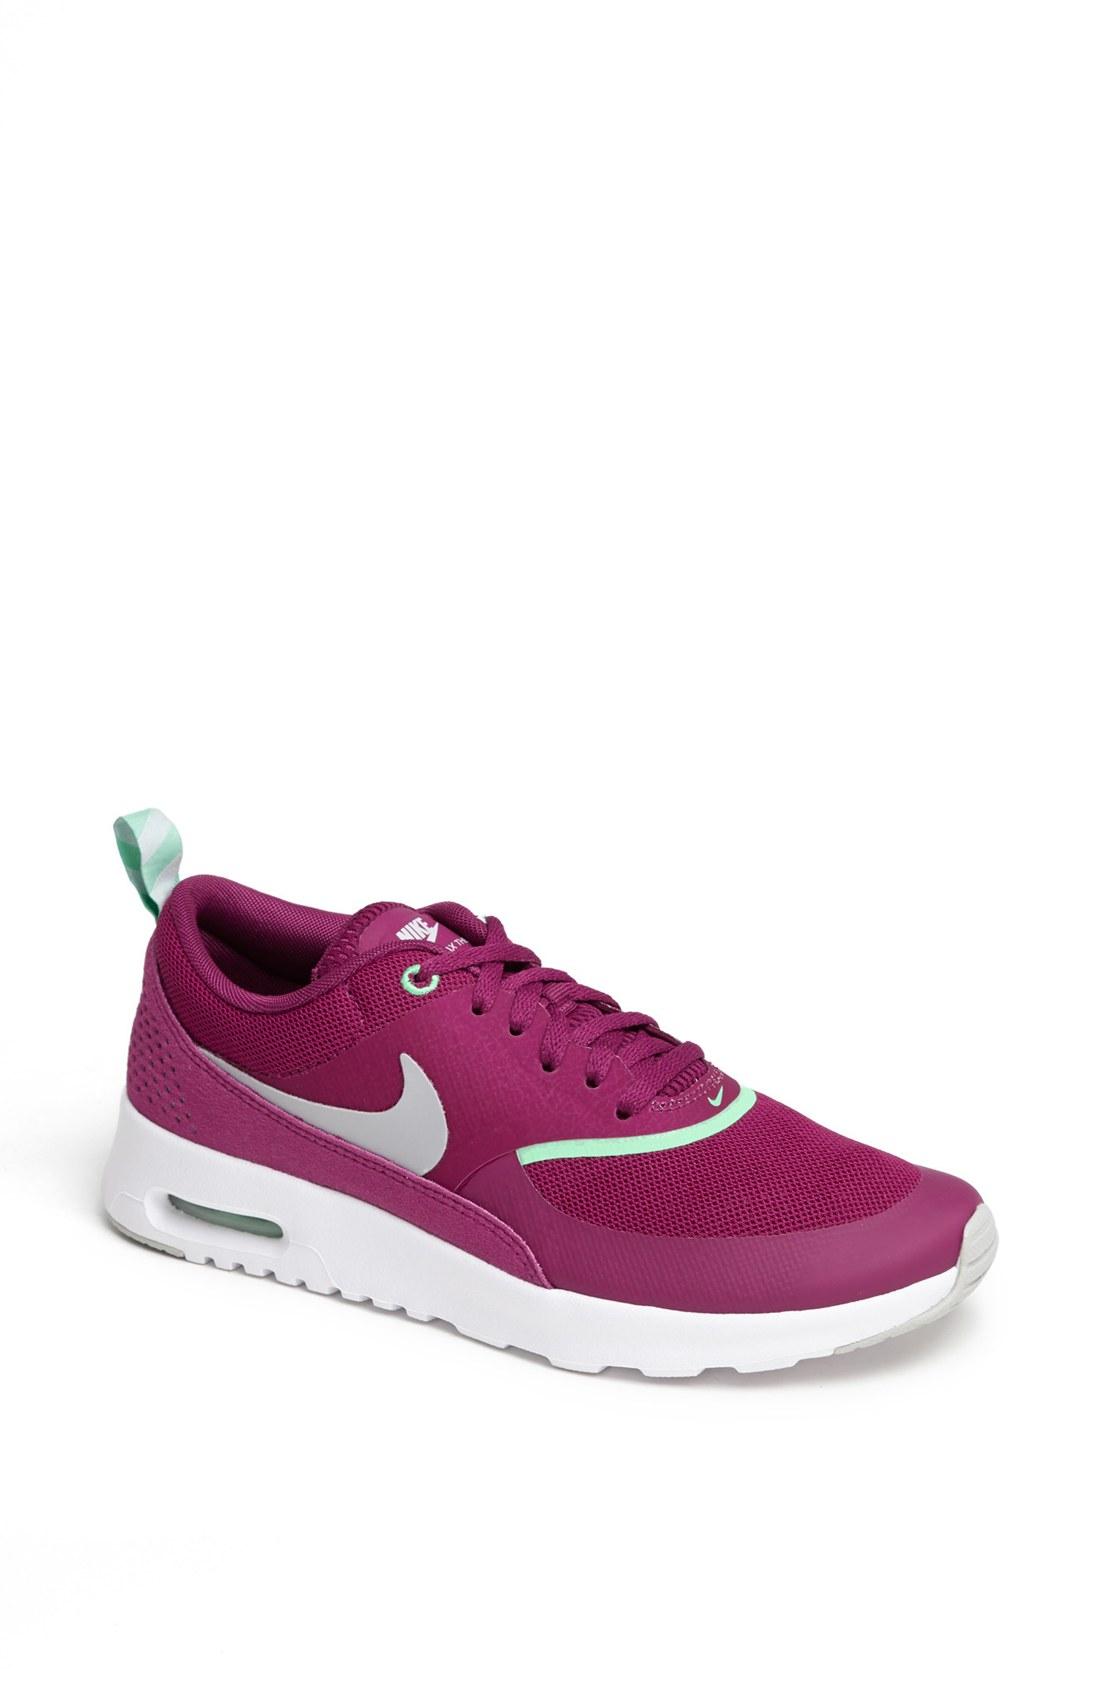 Nike Air Max Thea Raspberry Red